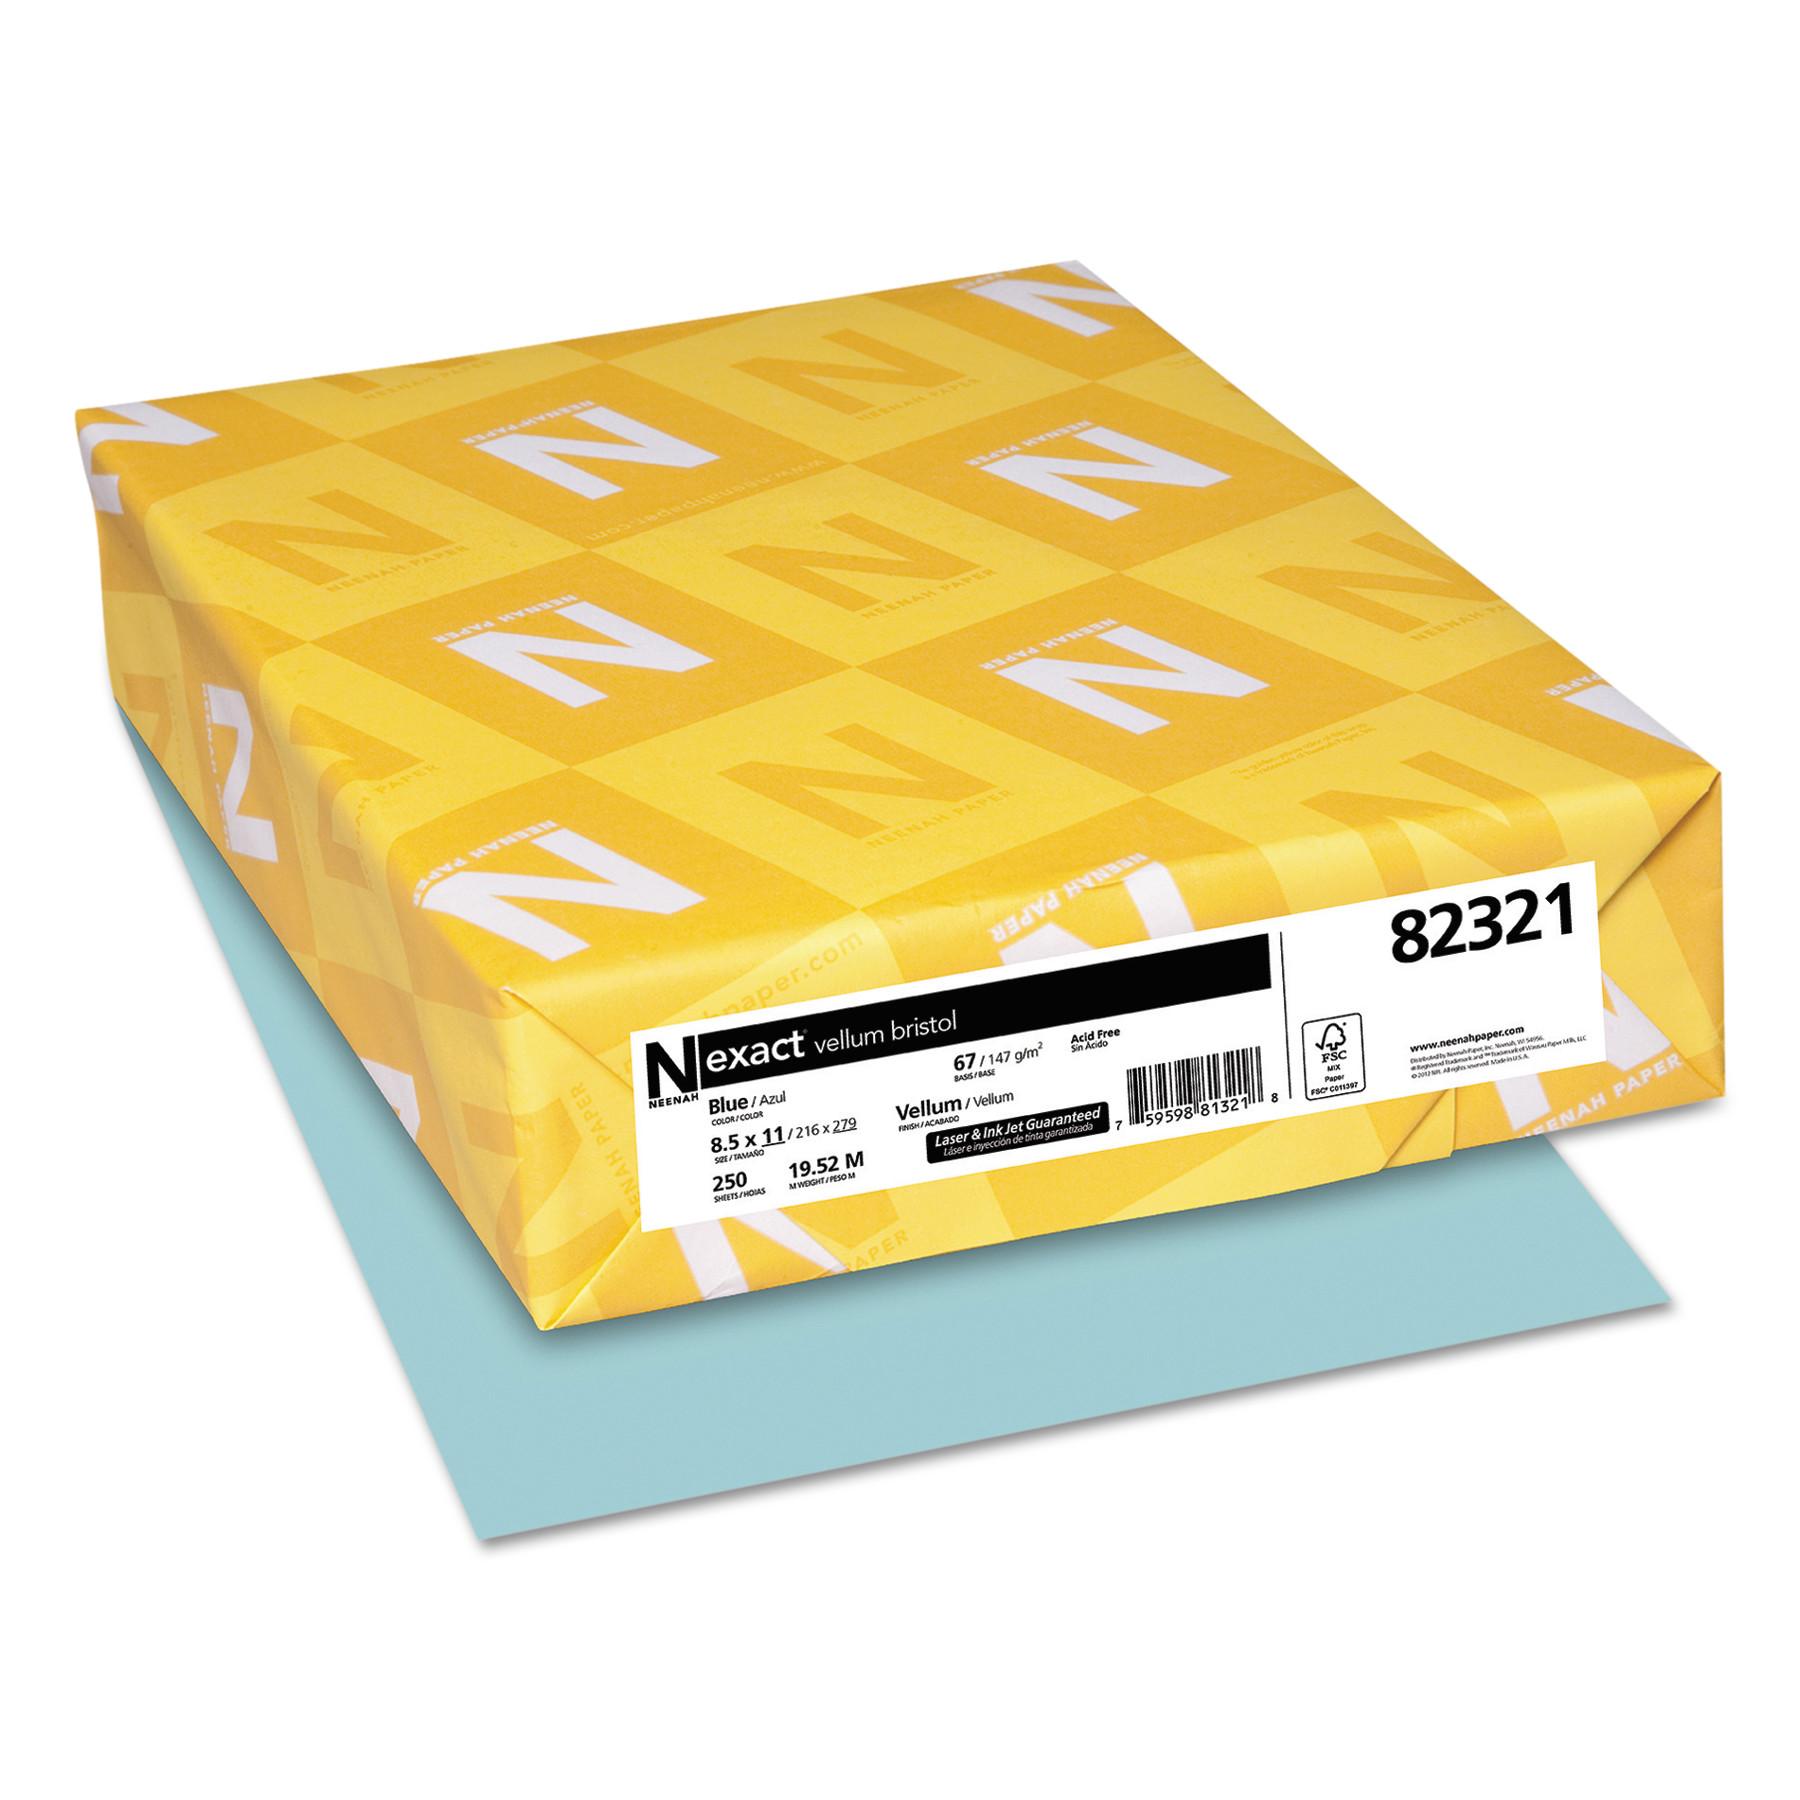 Neenah Paper Exact Vellum Bristol Cover Stock, 67lb, 8 1/2 x 11, Blue, 250 Sheets -WAU82321